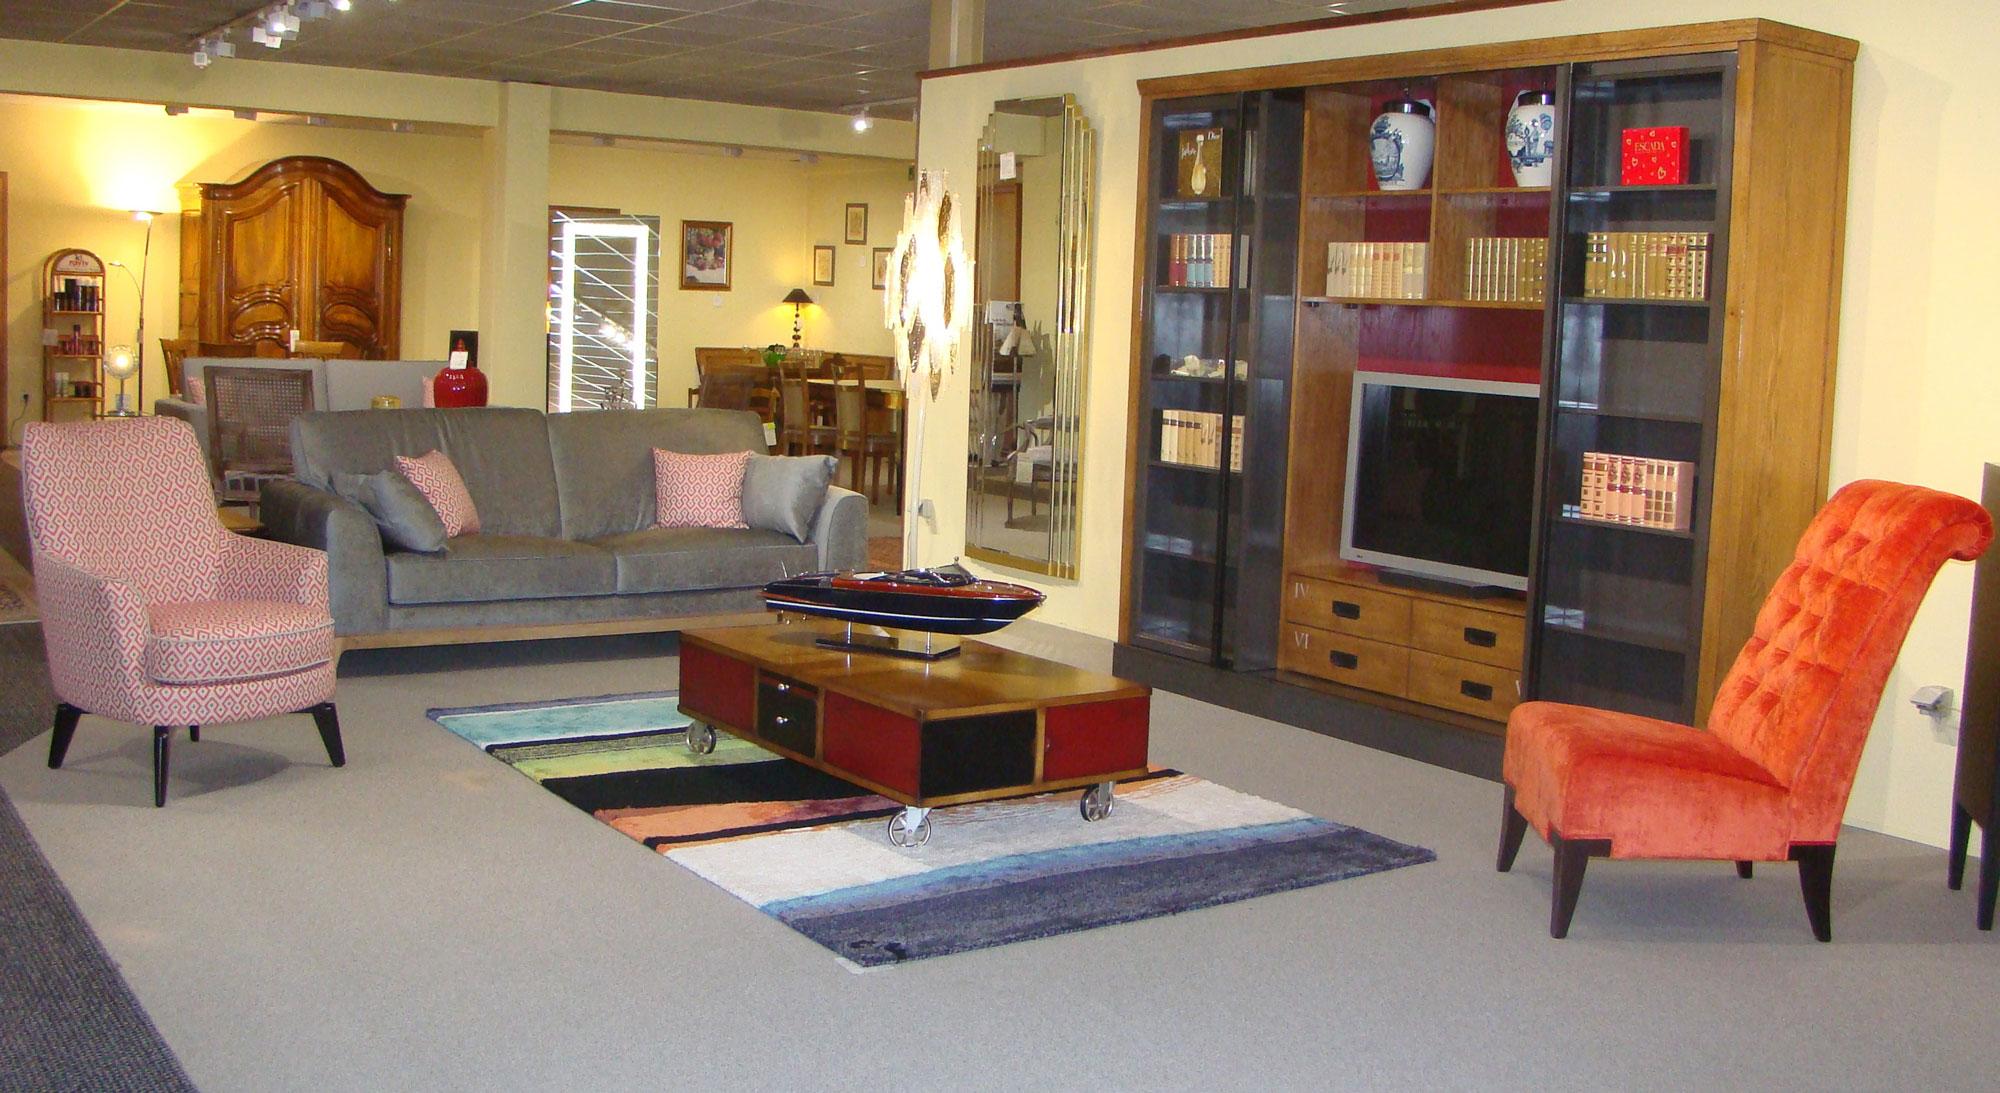 vente meuble multifonction t l vision biblioth que b blenheim. Black Bedroom Furniture Sets. Home Design Ideas